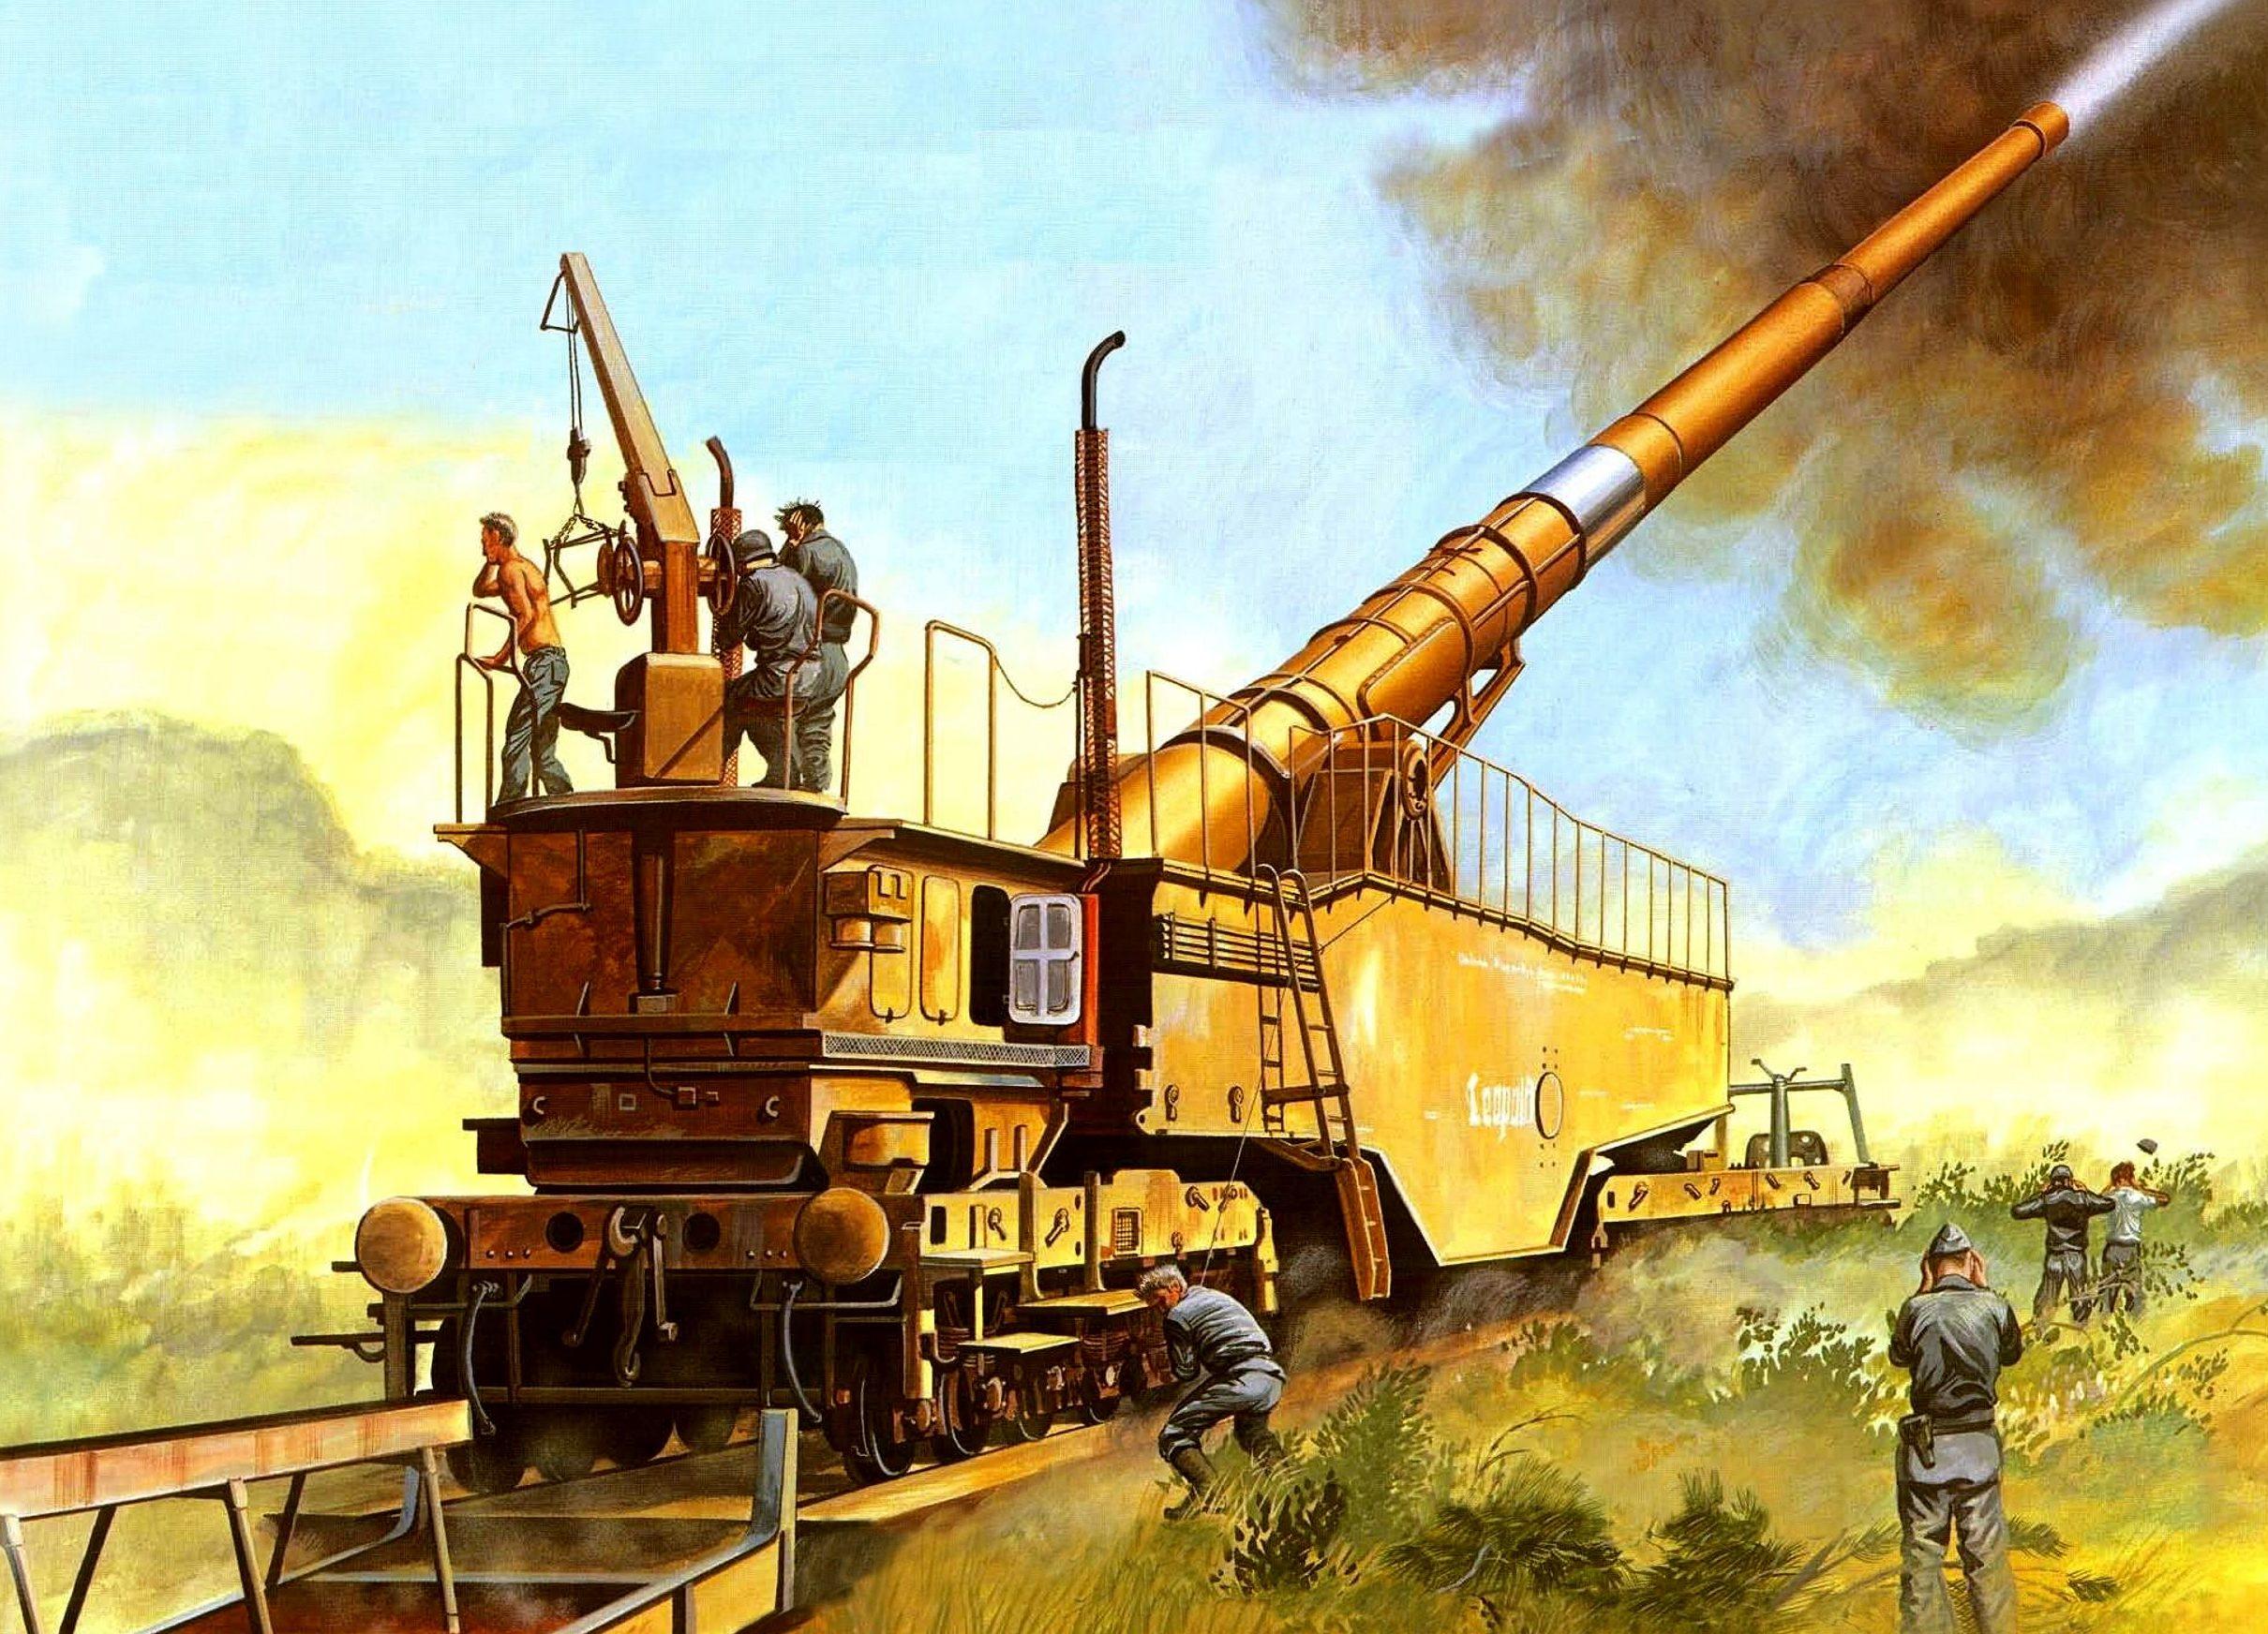 Greer Don. Железнодорожное 28-cm орудие K5(E) Leopold.